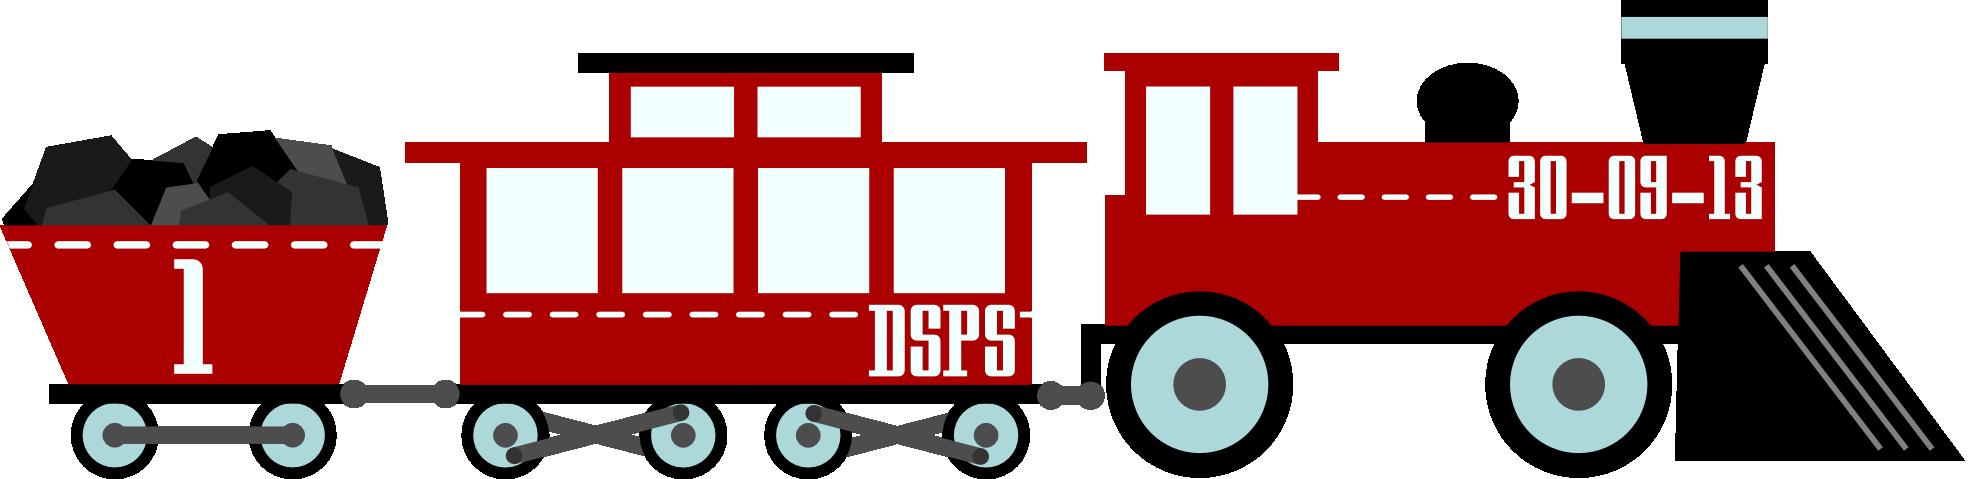 clip art free download Coal train clipart. Toy blueprints google search